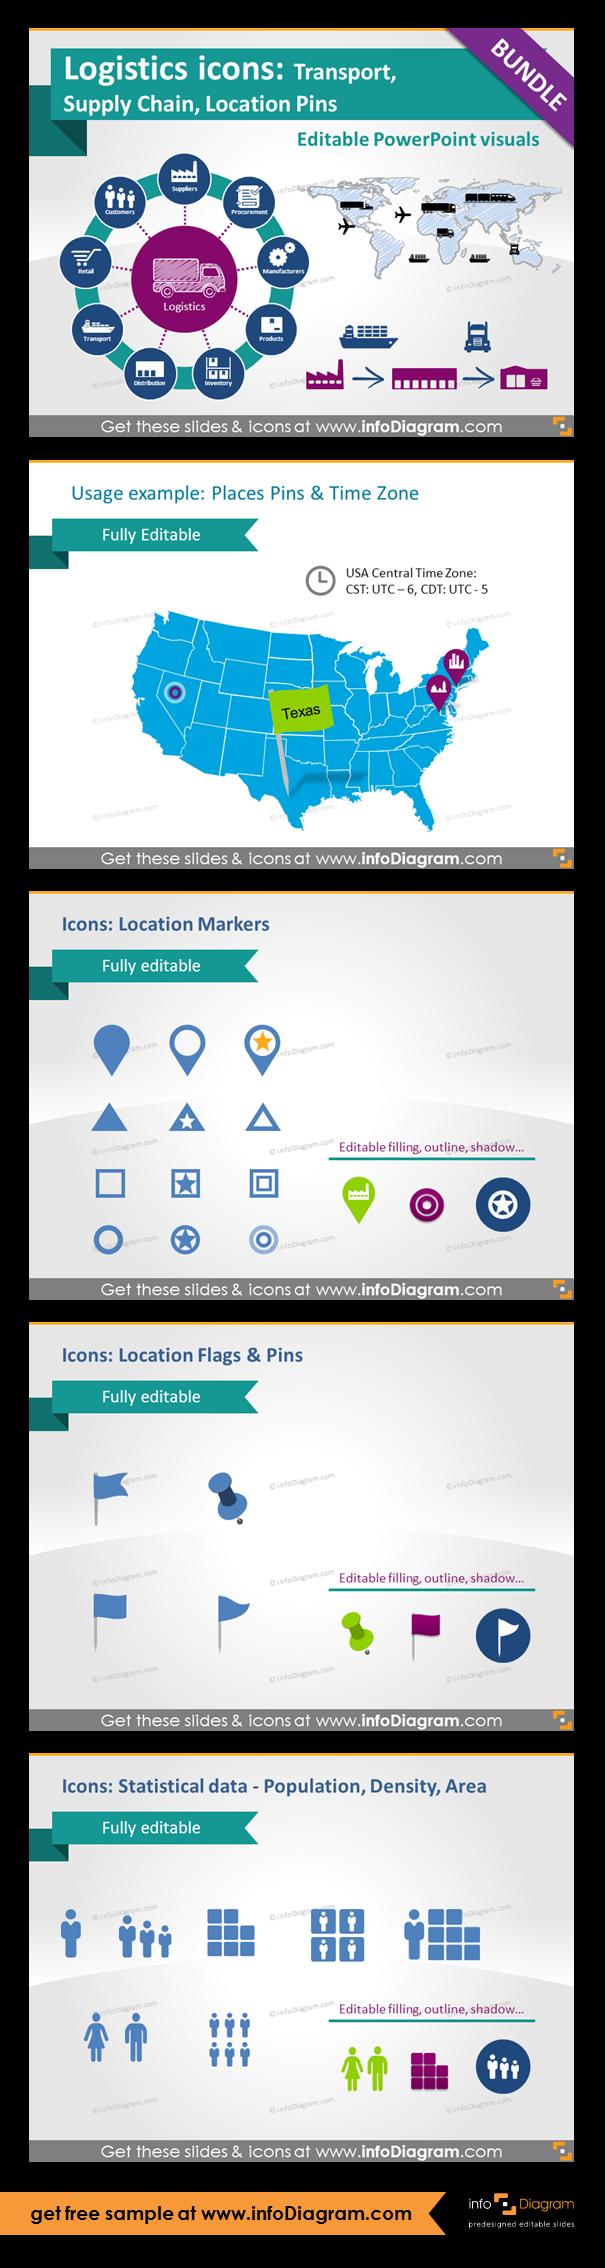 Logistics icons: Transport, Supply Chain Management, SCM